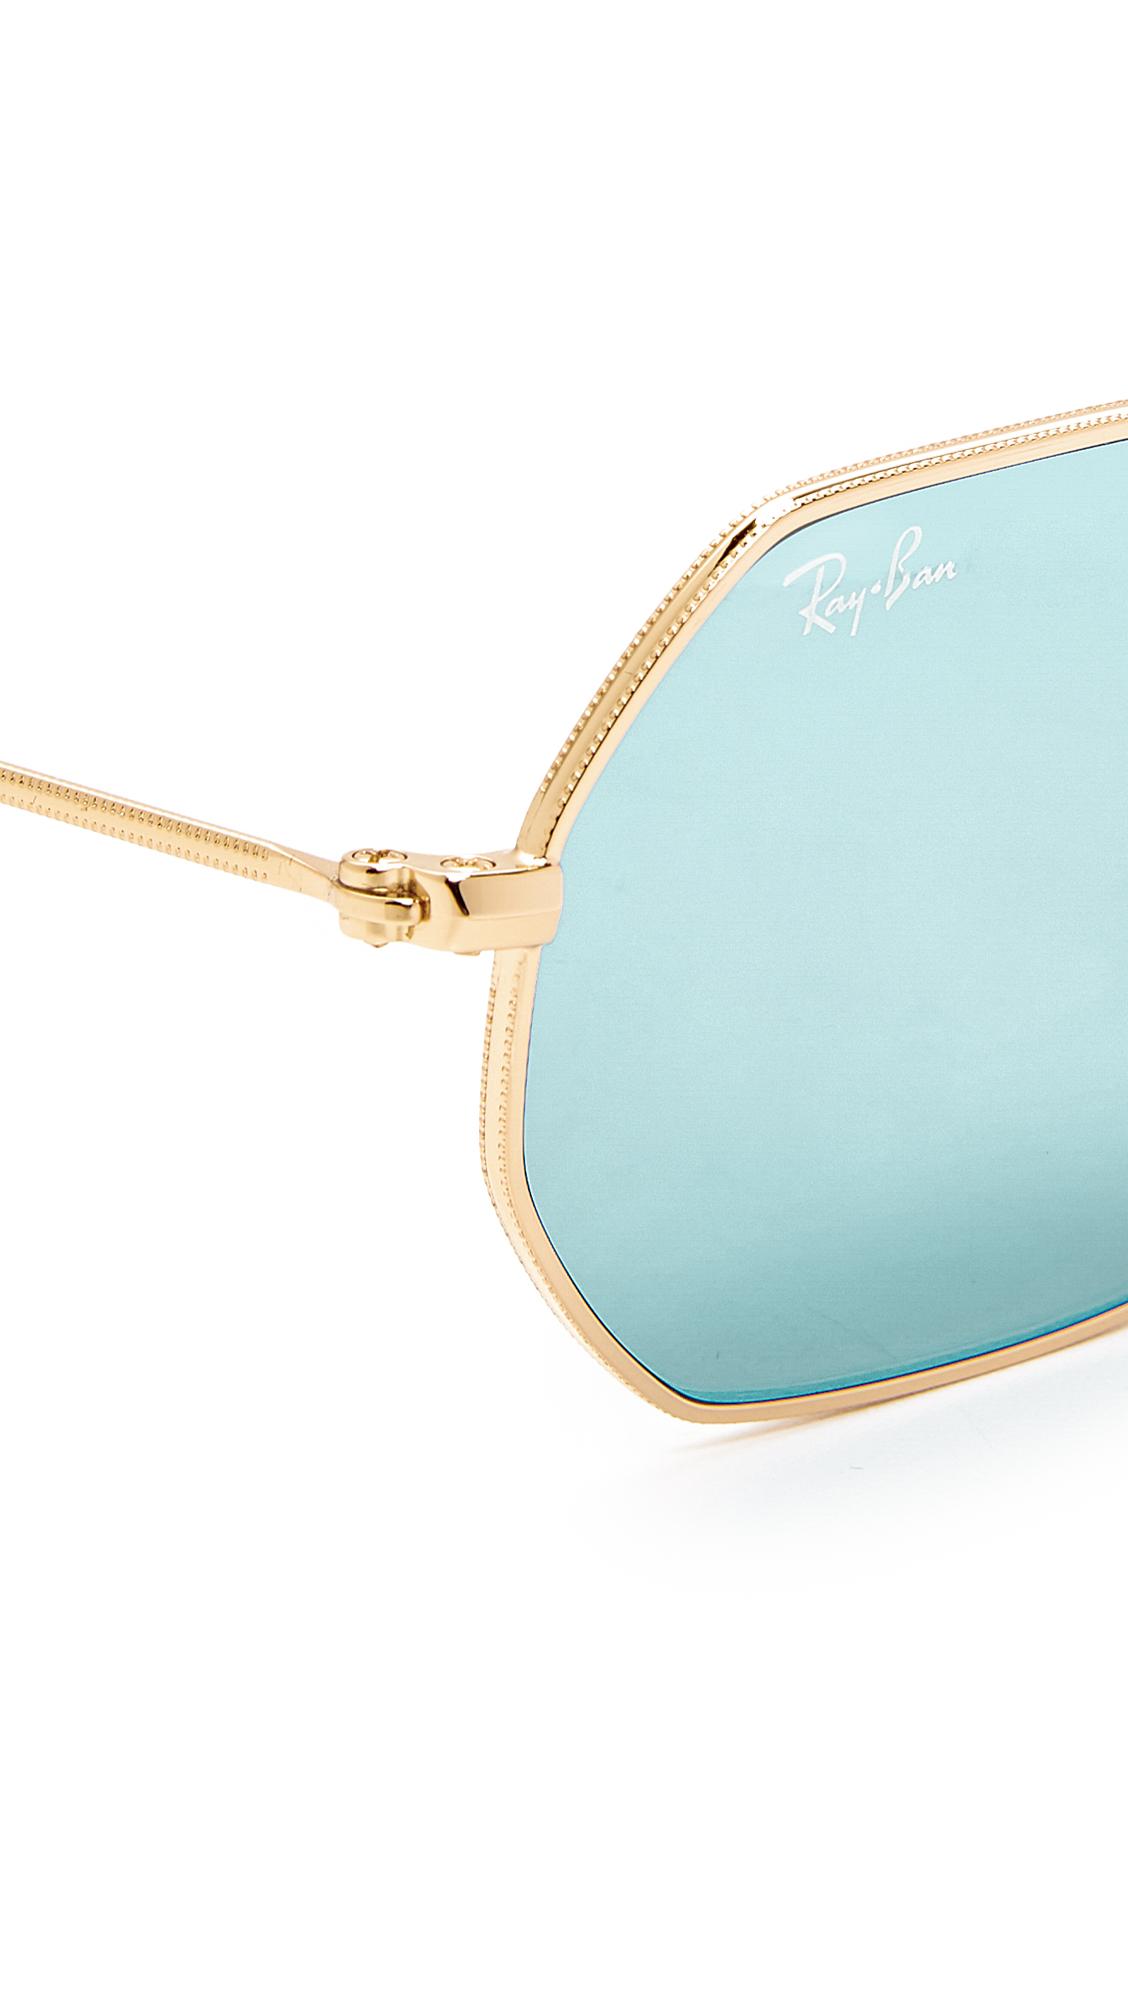 8f70b06131 Ray-Ban Octagon Flat Lens Sunglasses